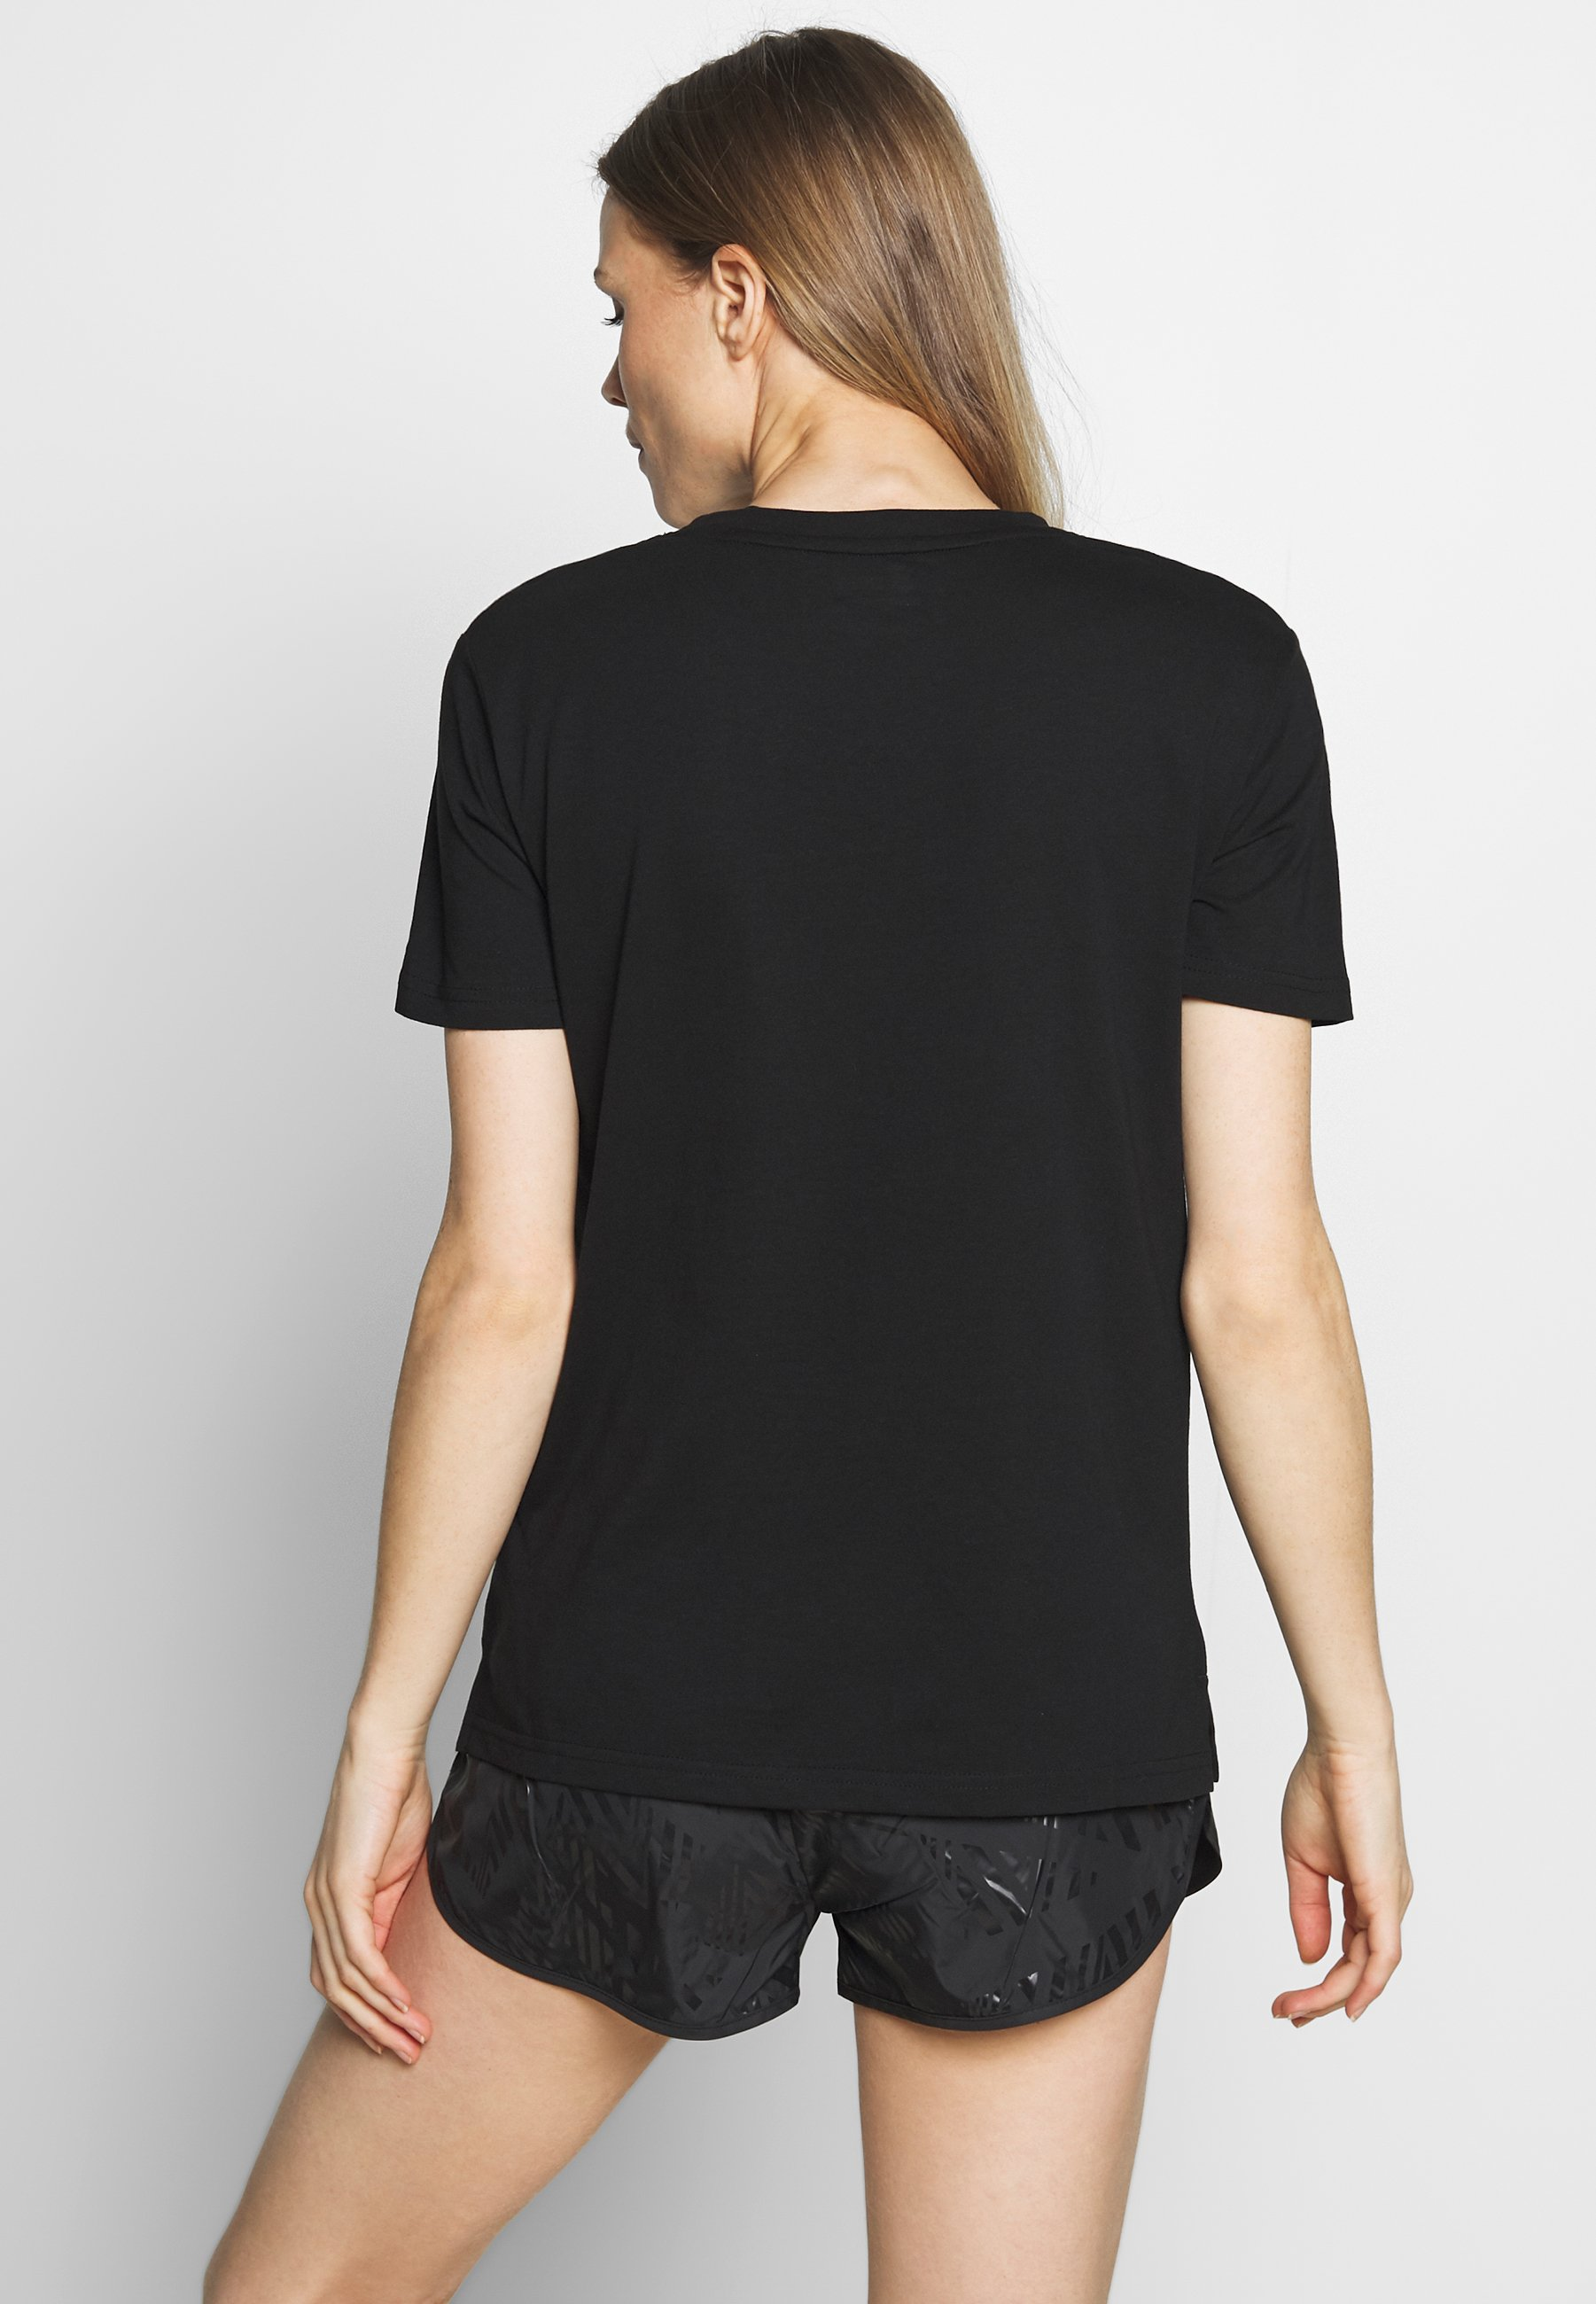 Lotto Smart Tee - Basic T-shirt All Black/brilliant White